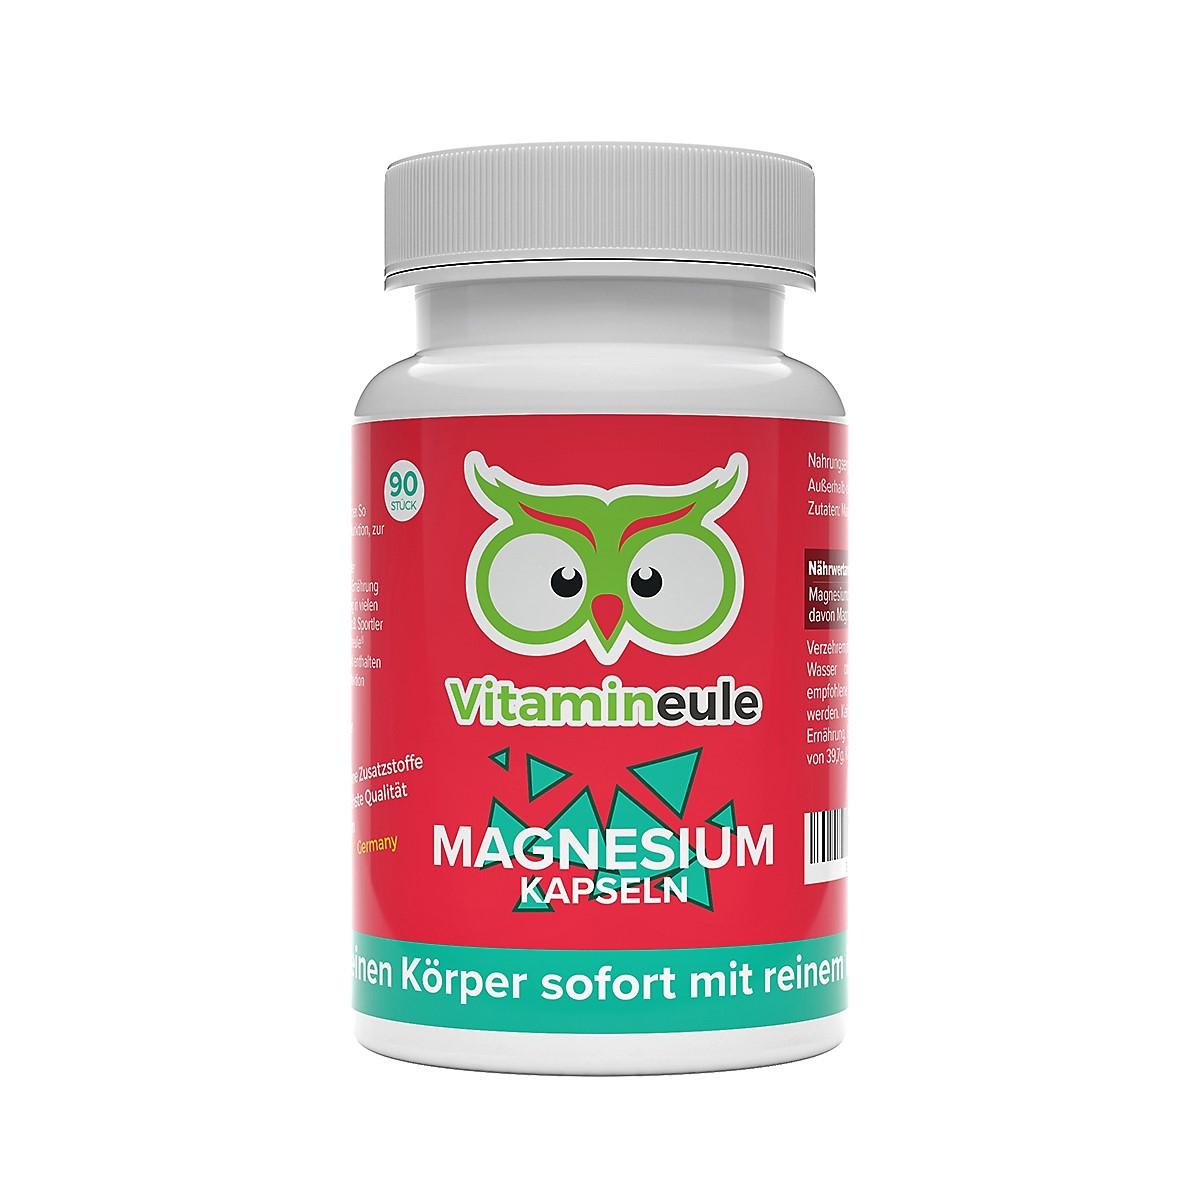 Magnesium Kapseln von Vitamineule